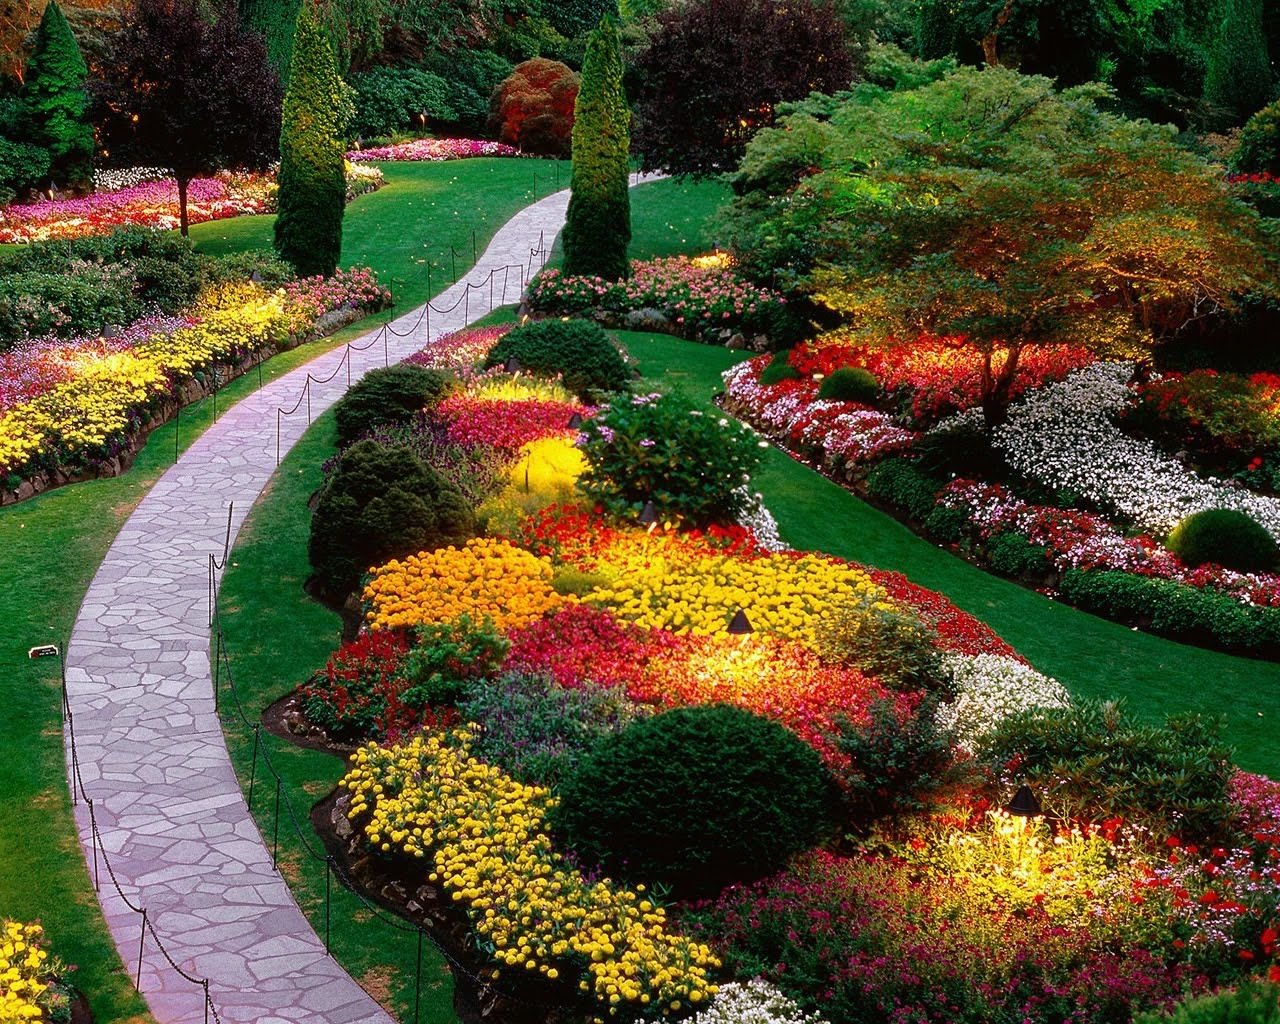 spring flowers   far views   garden landscaping, sunken garden